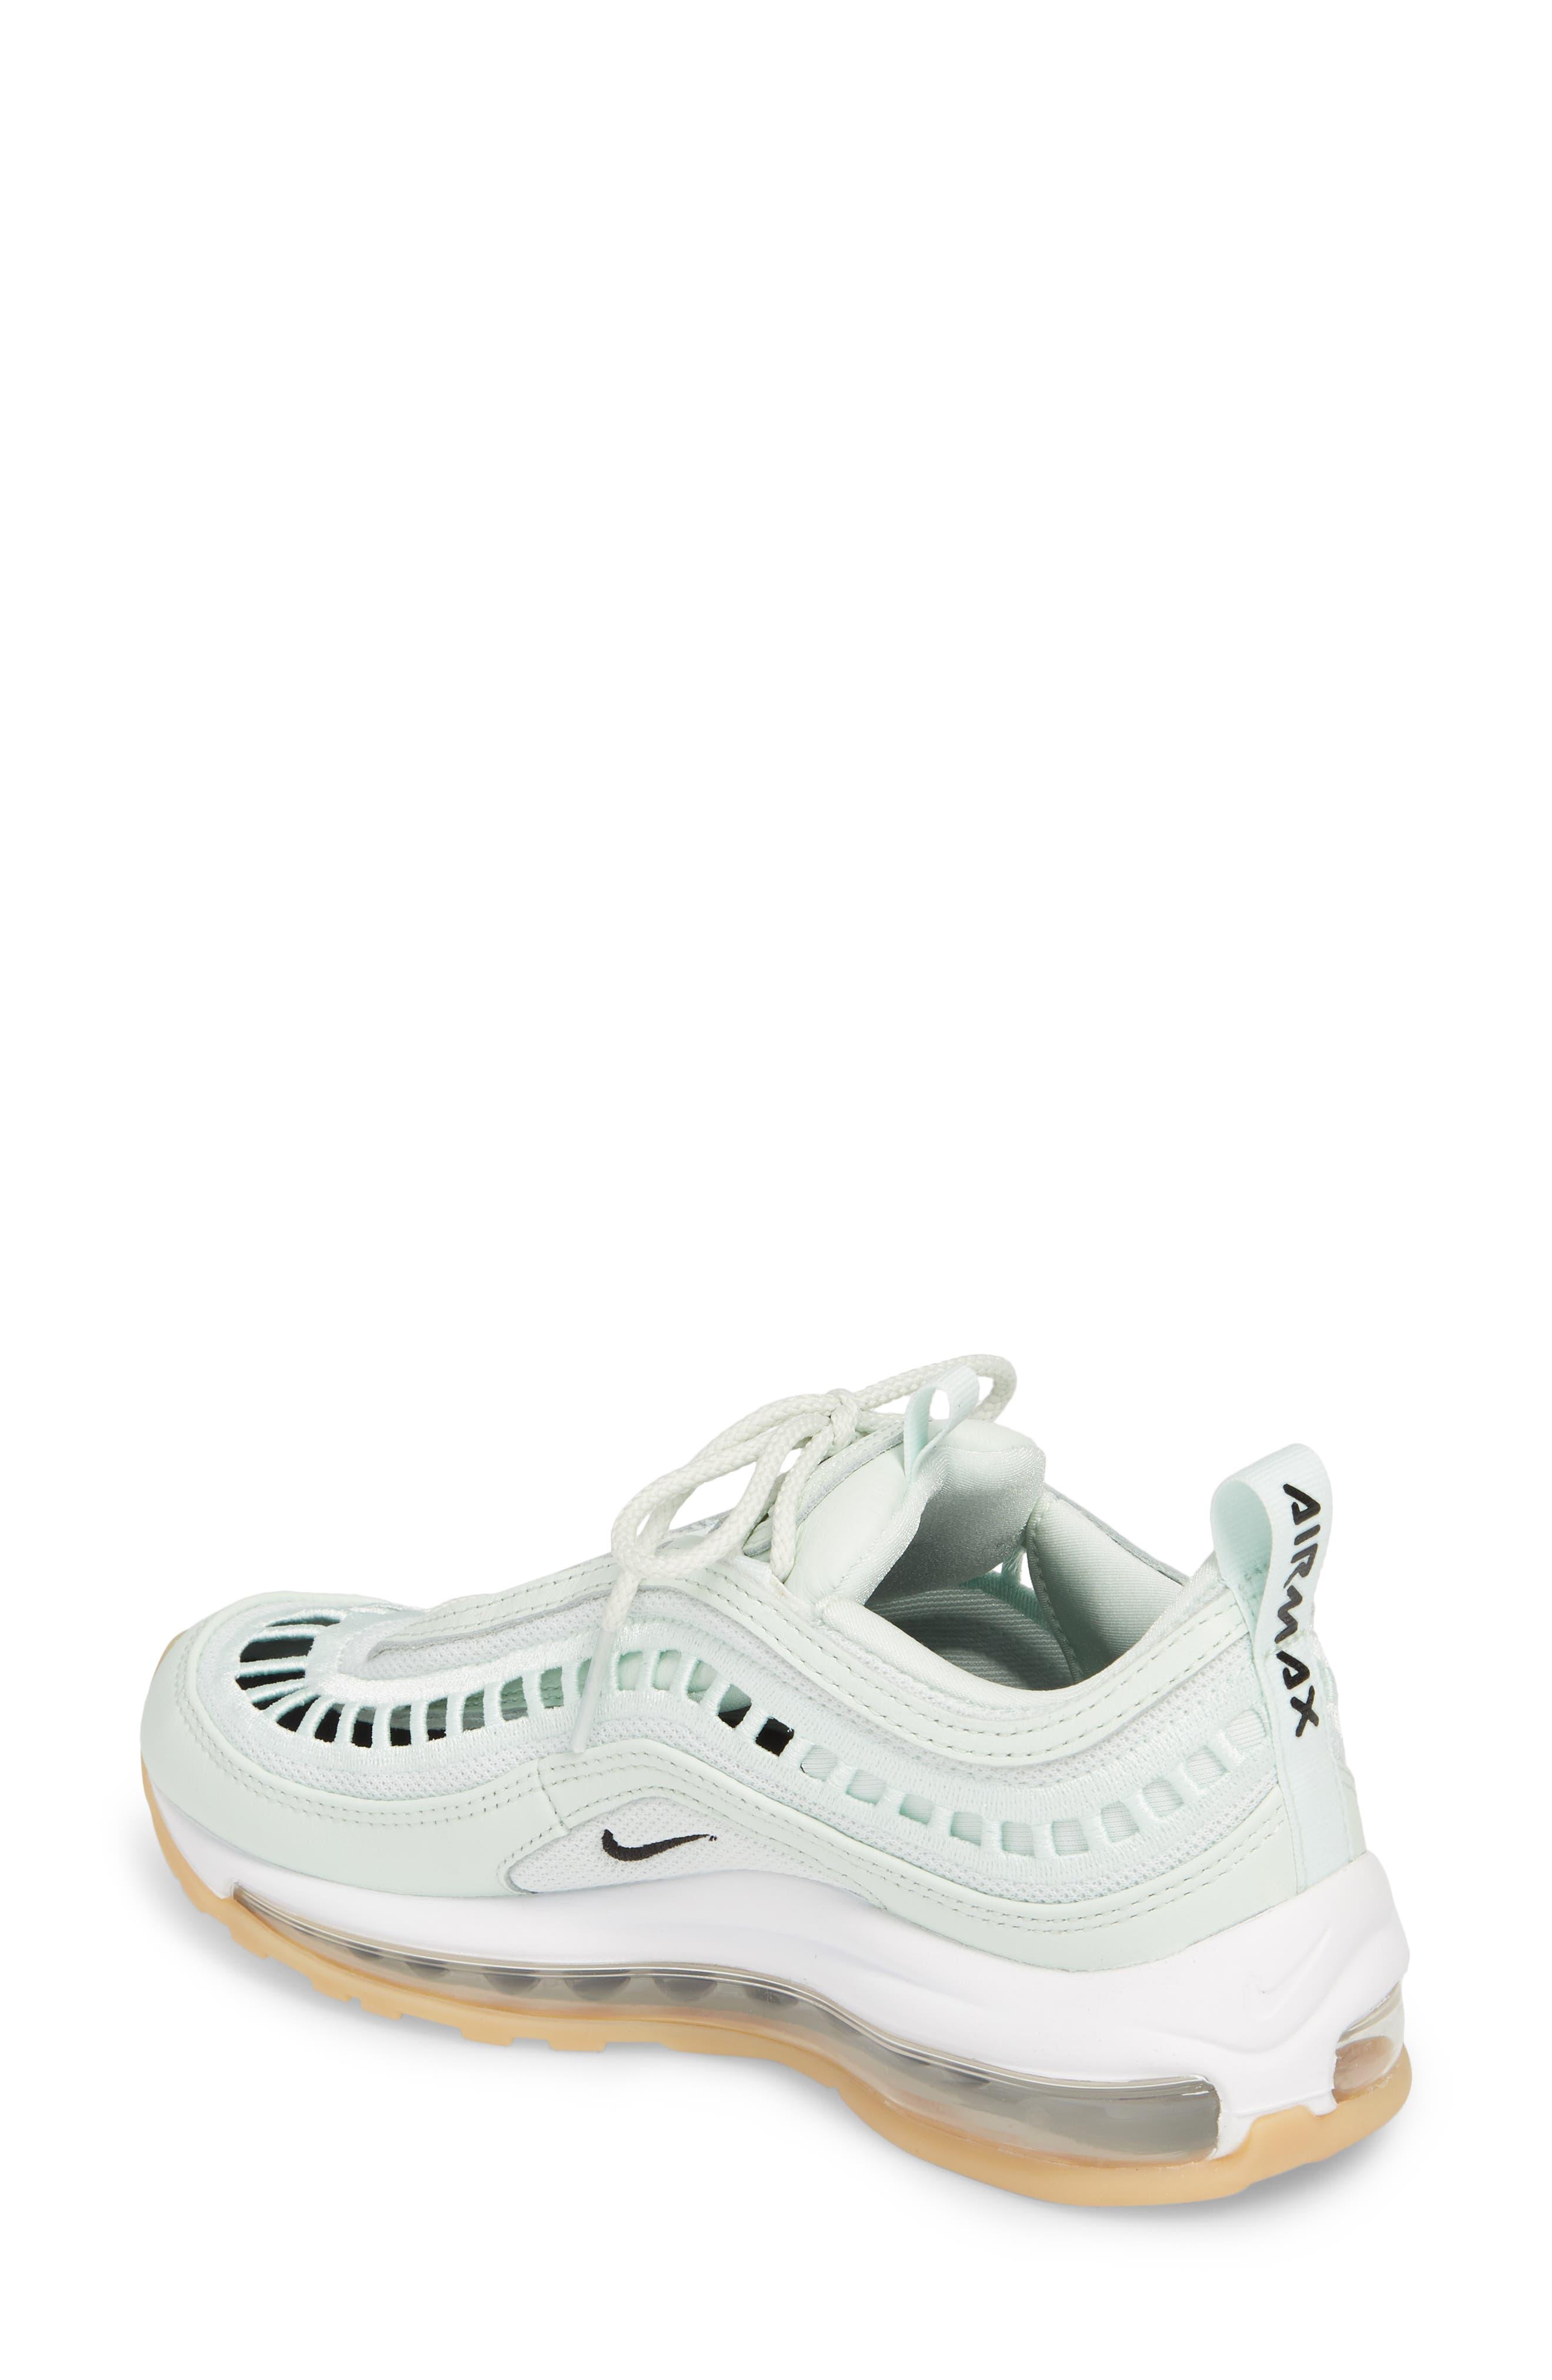 Air Max 97 Ultra '17 SI Sneaker,                             Alternate thumbnail 2, color,                             020